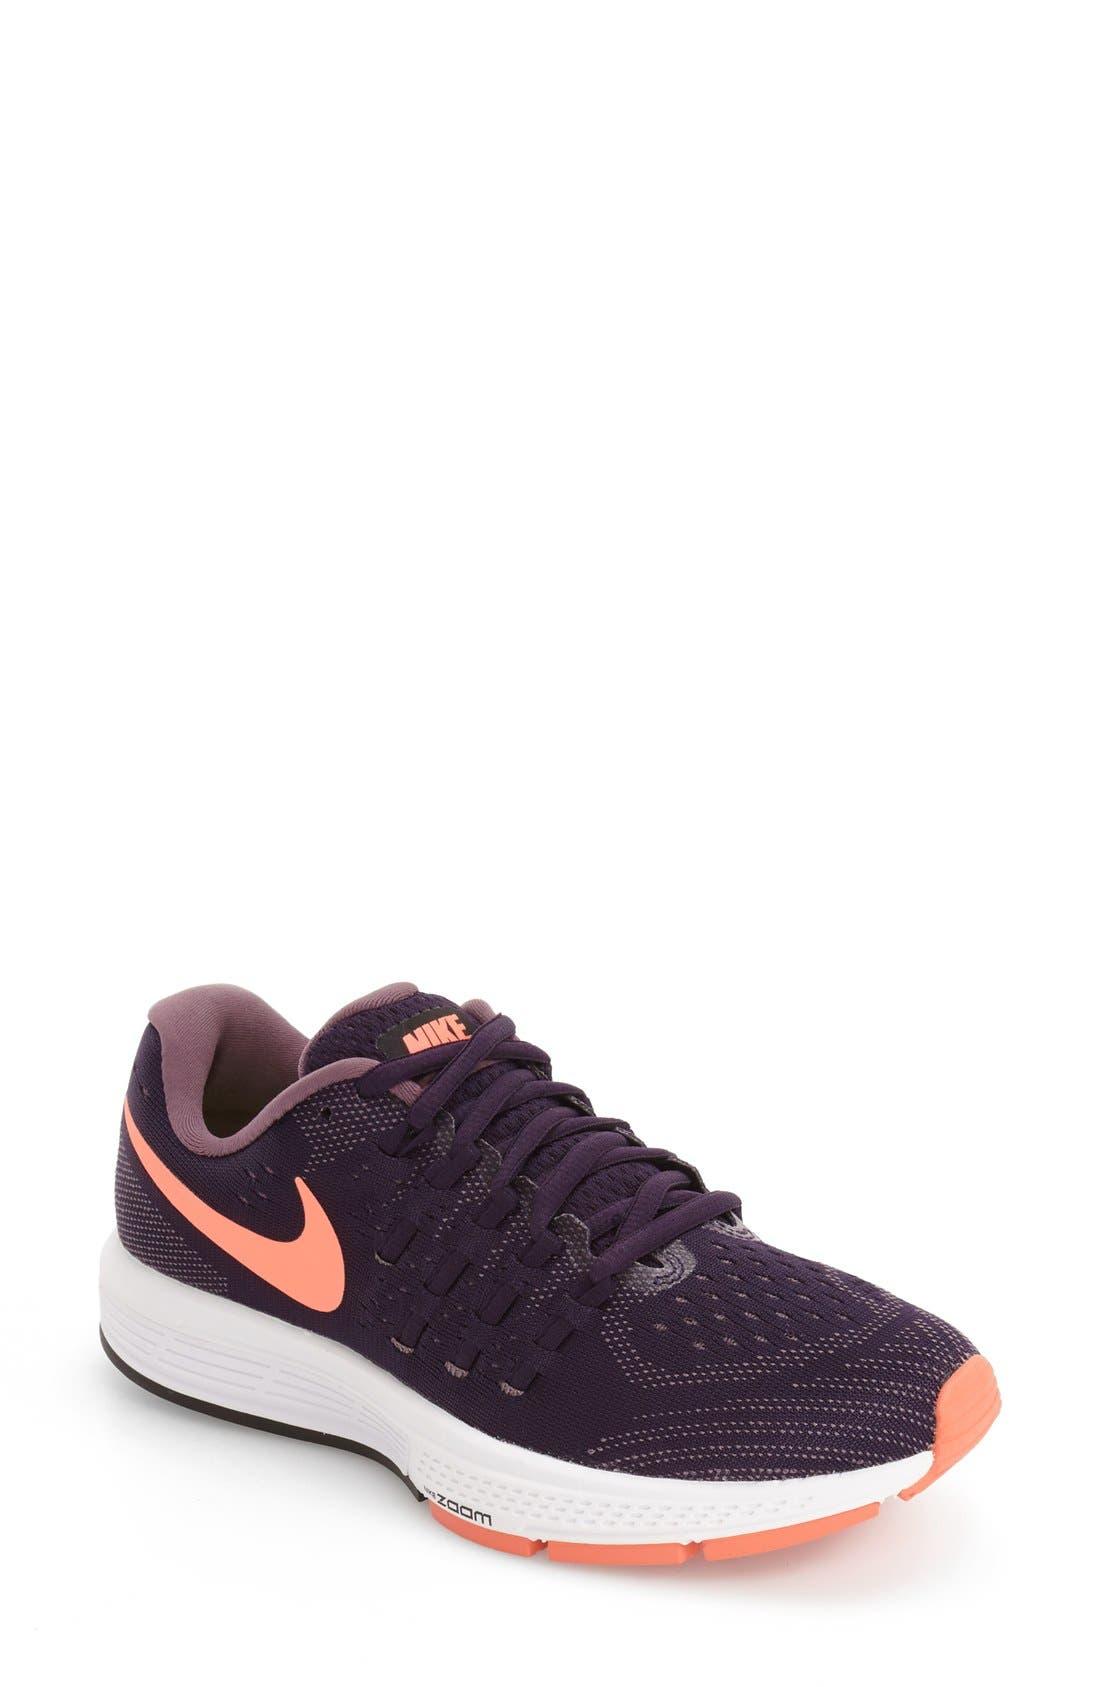 Main Image - Nike Air Zoom Vomero 11 Sneaker (Women)